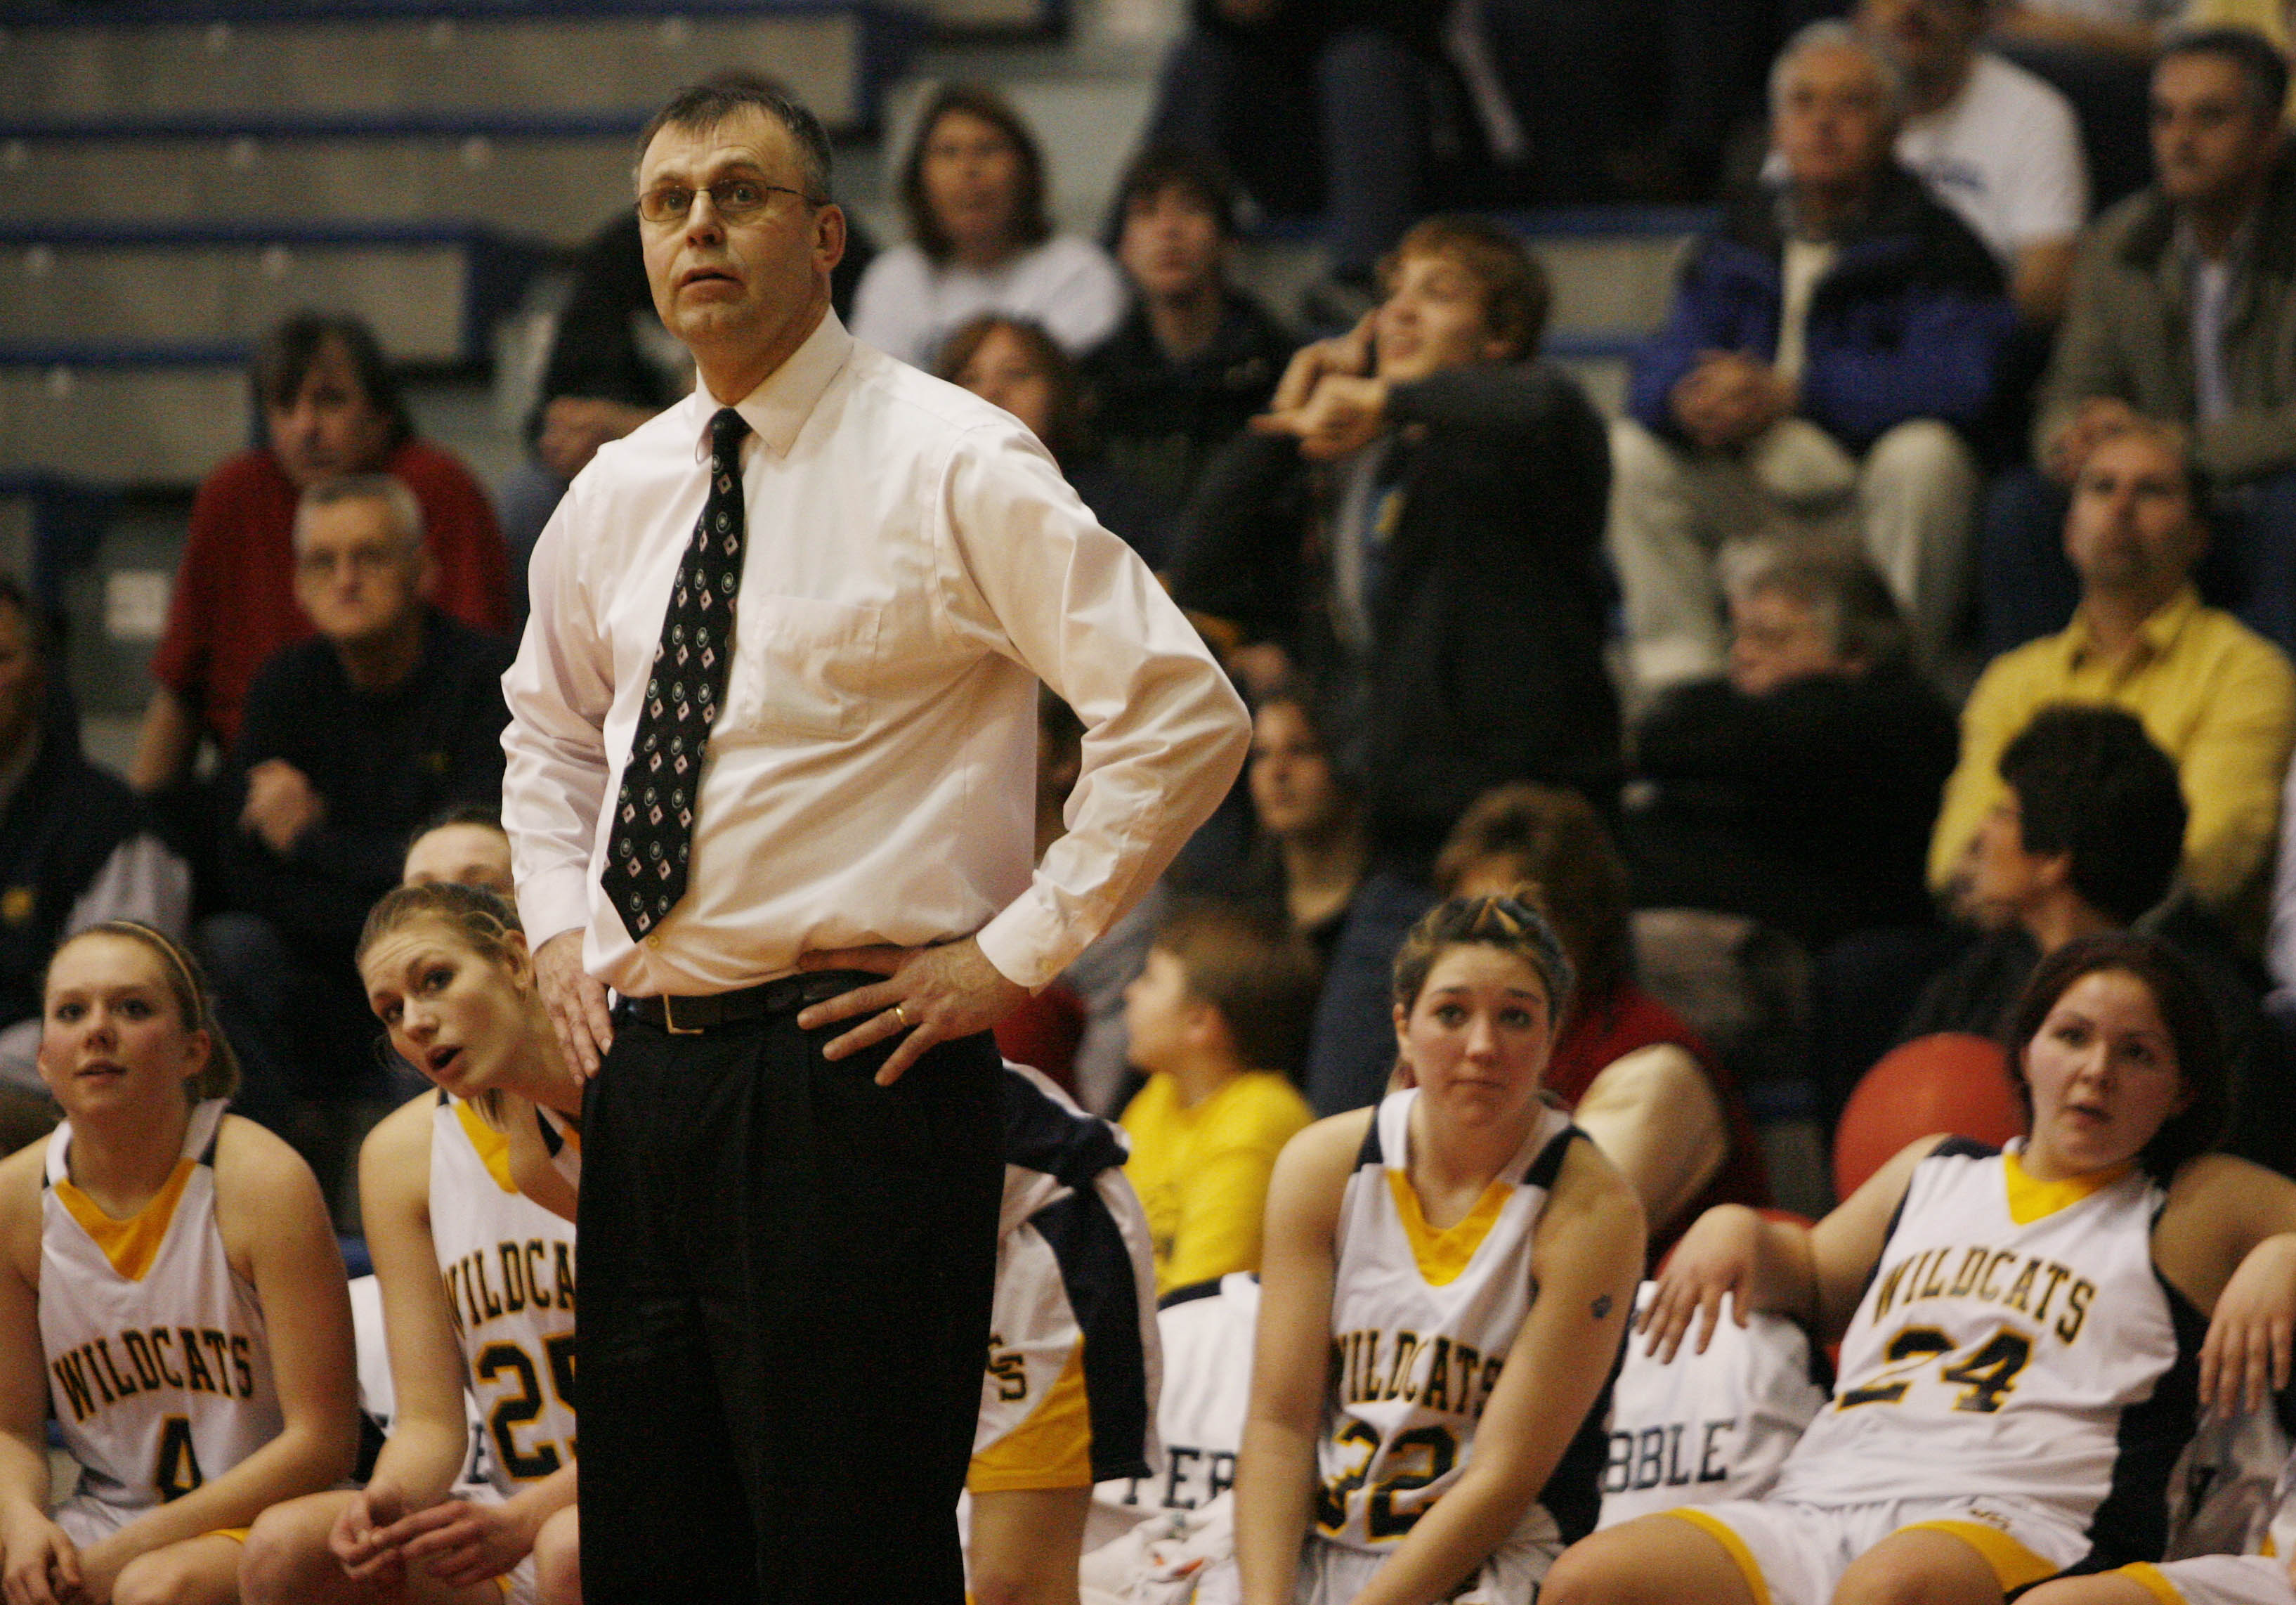 Sherman girls basketball coach Mel Swanson has compiled 607 wins.  (Mark Mulville/Buffalo News file photo).